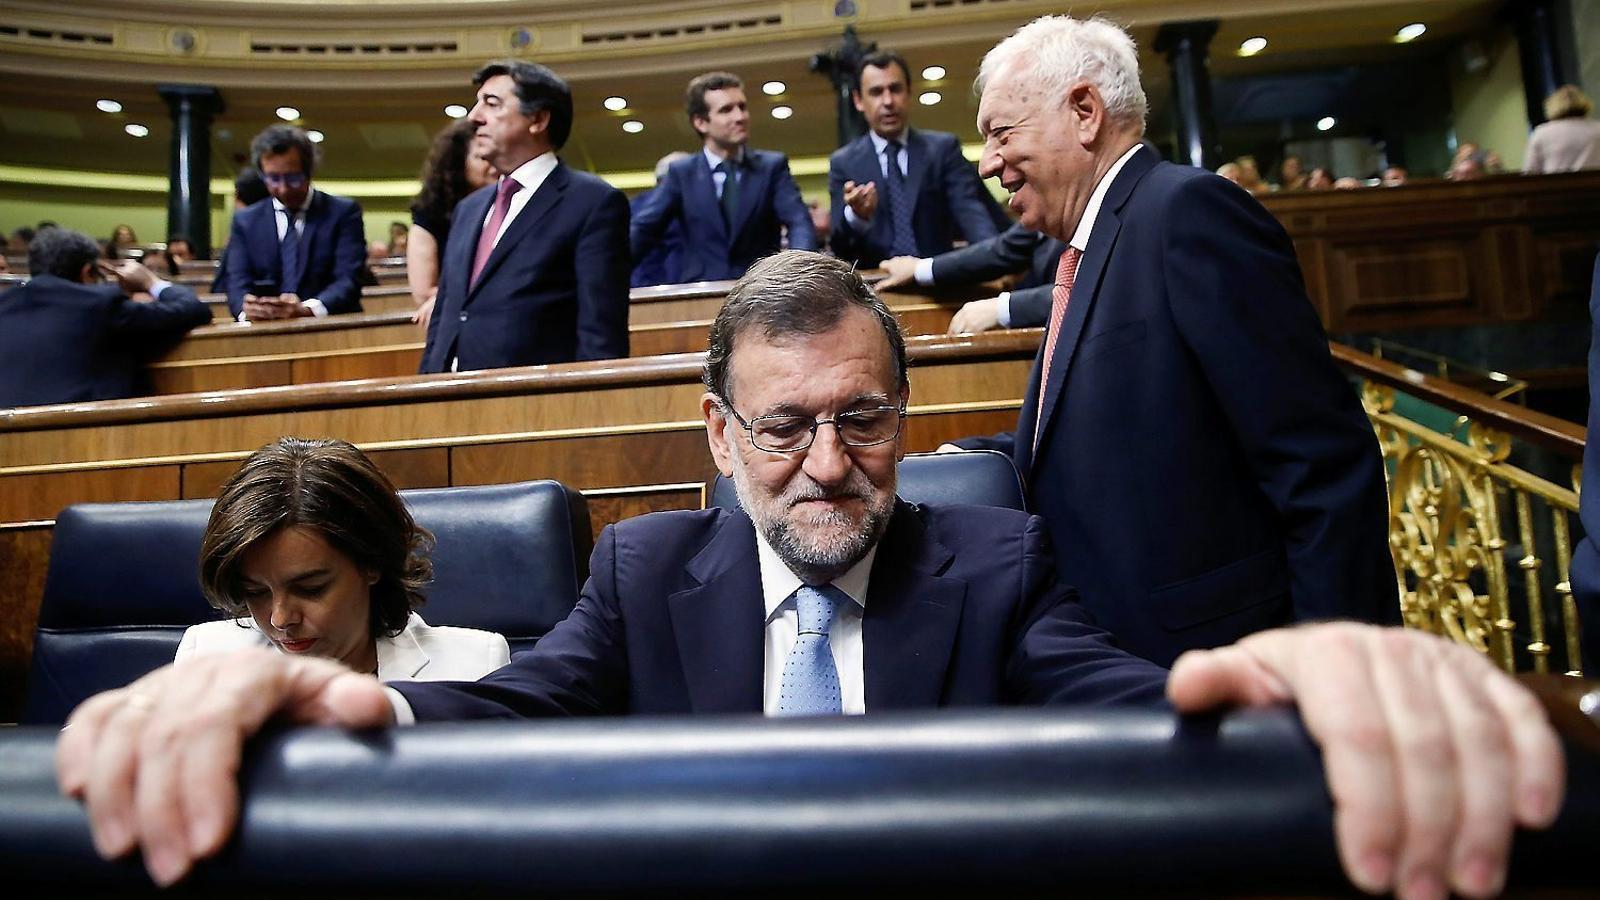 Mariano Rajoy i la seva número dos, Soraya Sáenz de Santamaría, durant el ple de constitució del Congrés.